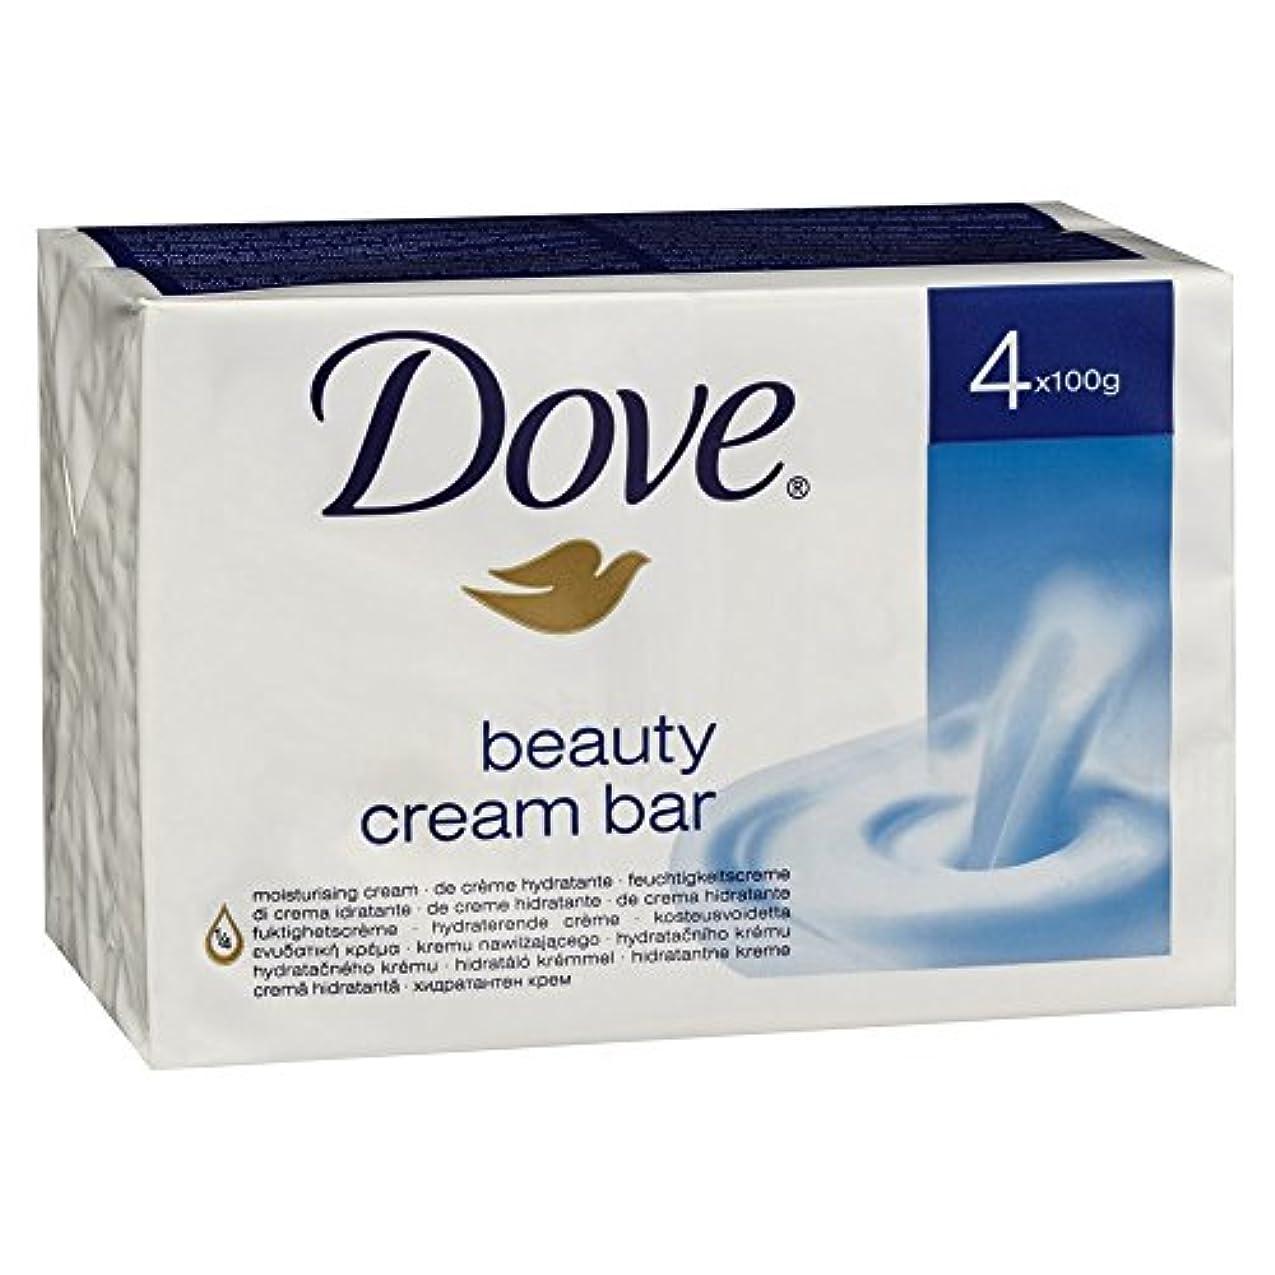 Dove どこ美容クリームバー石鹸4x100g